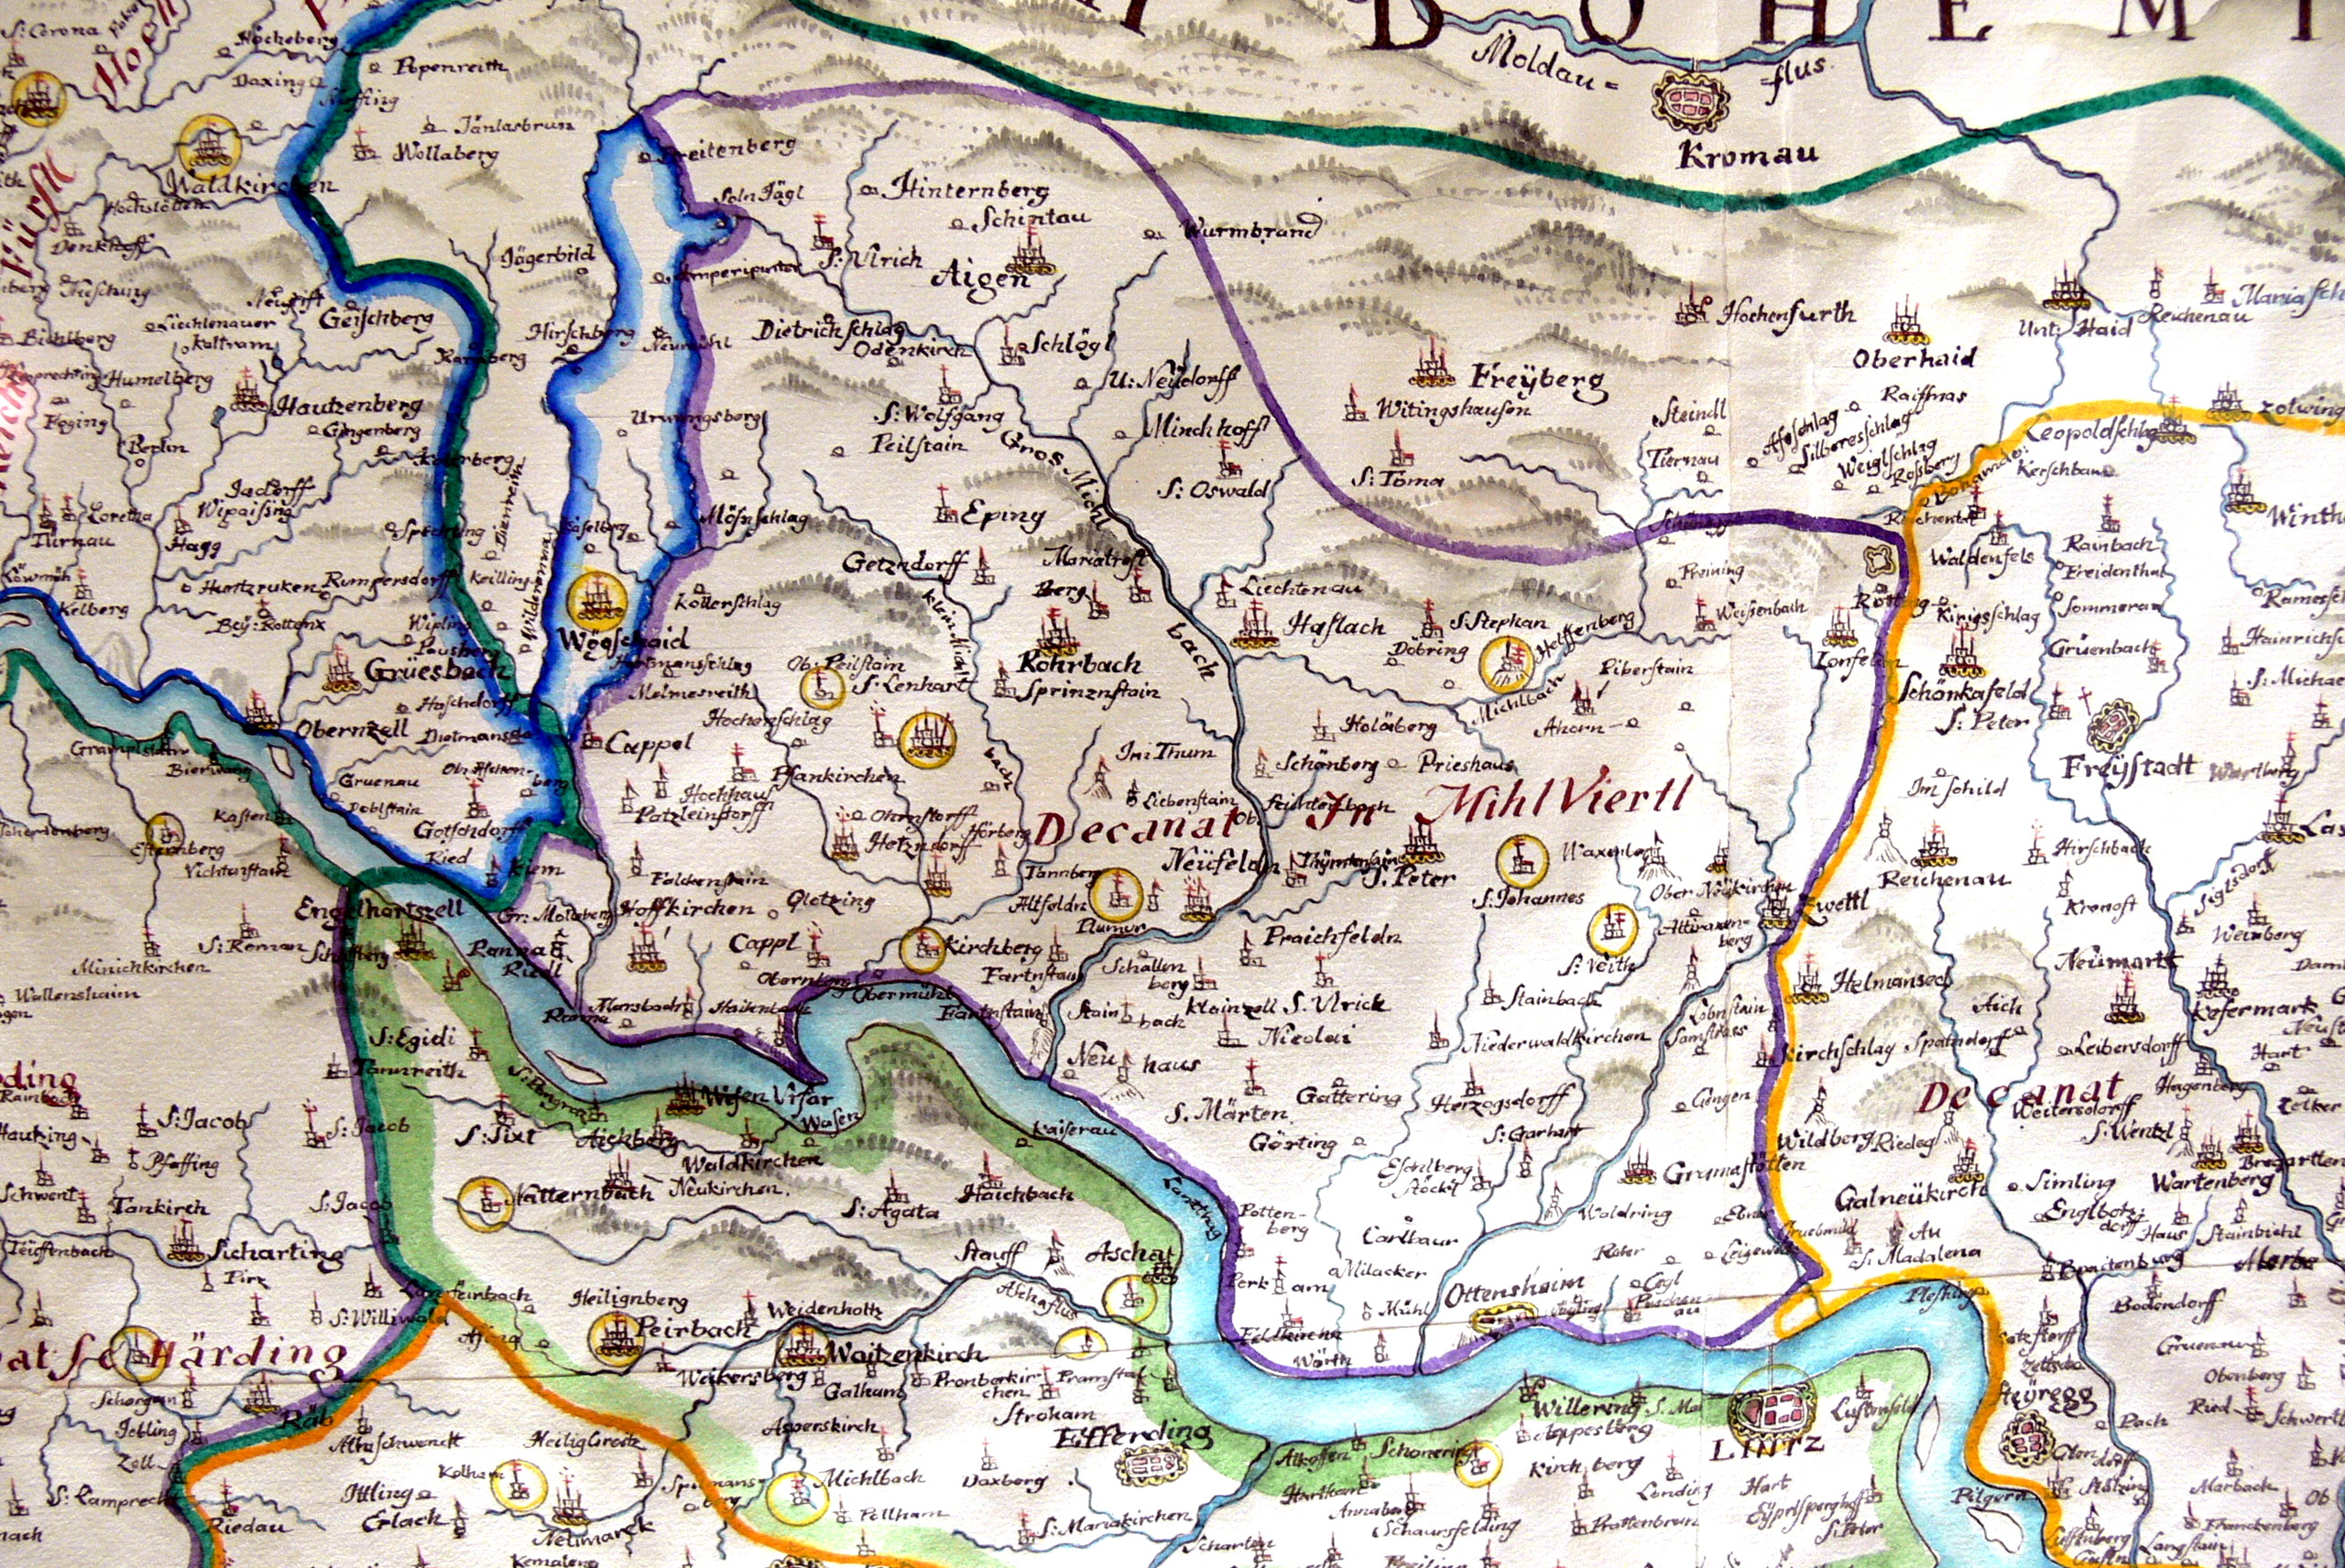 mühlviertel karte File:OHM   Karte Bistum Passau 1 Mühlviertel.   Wikimedia Commons